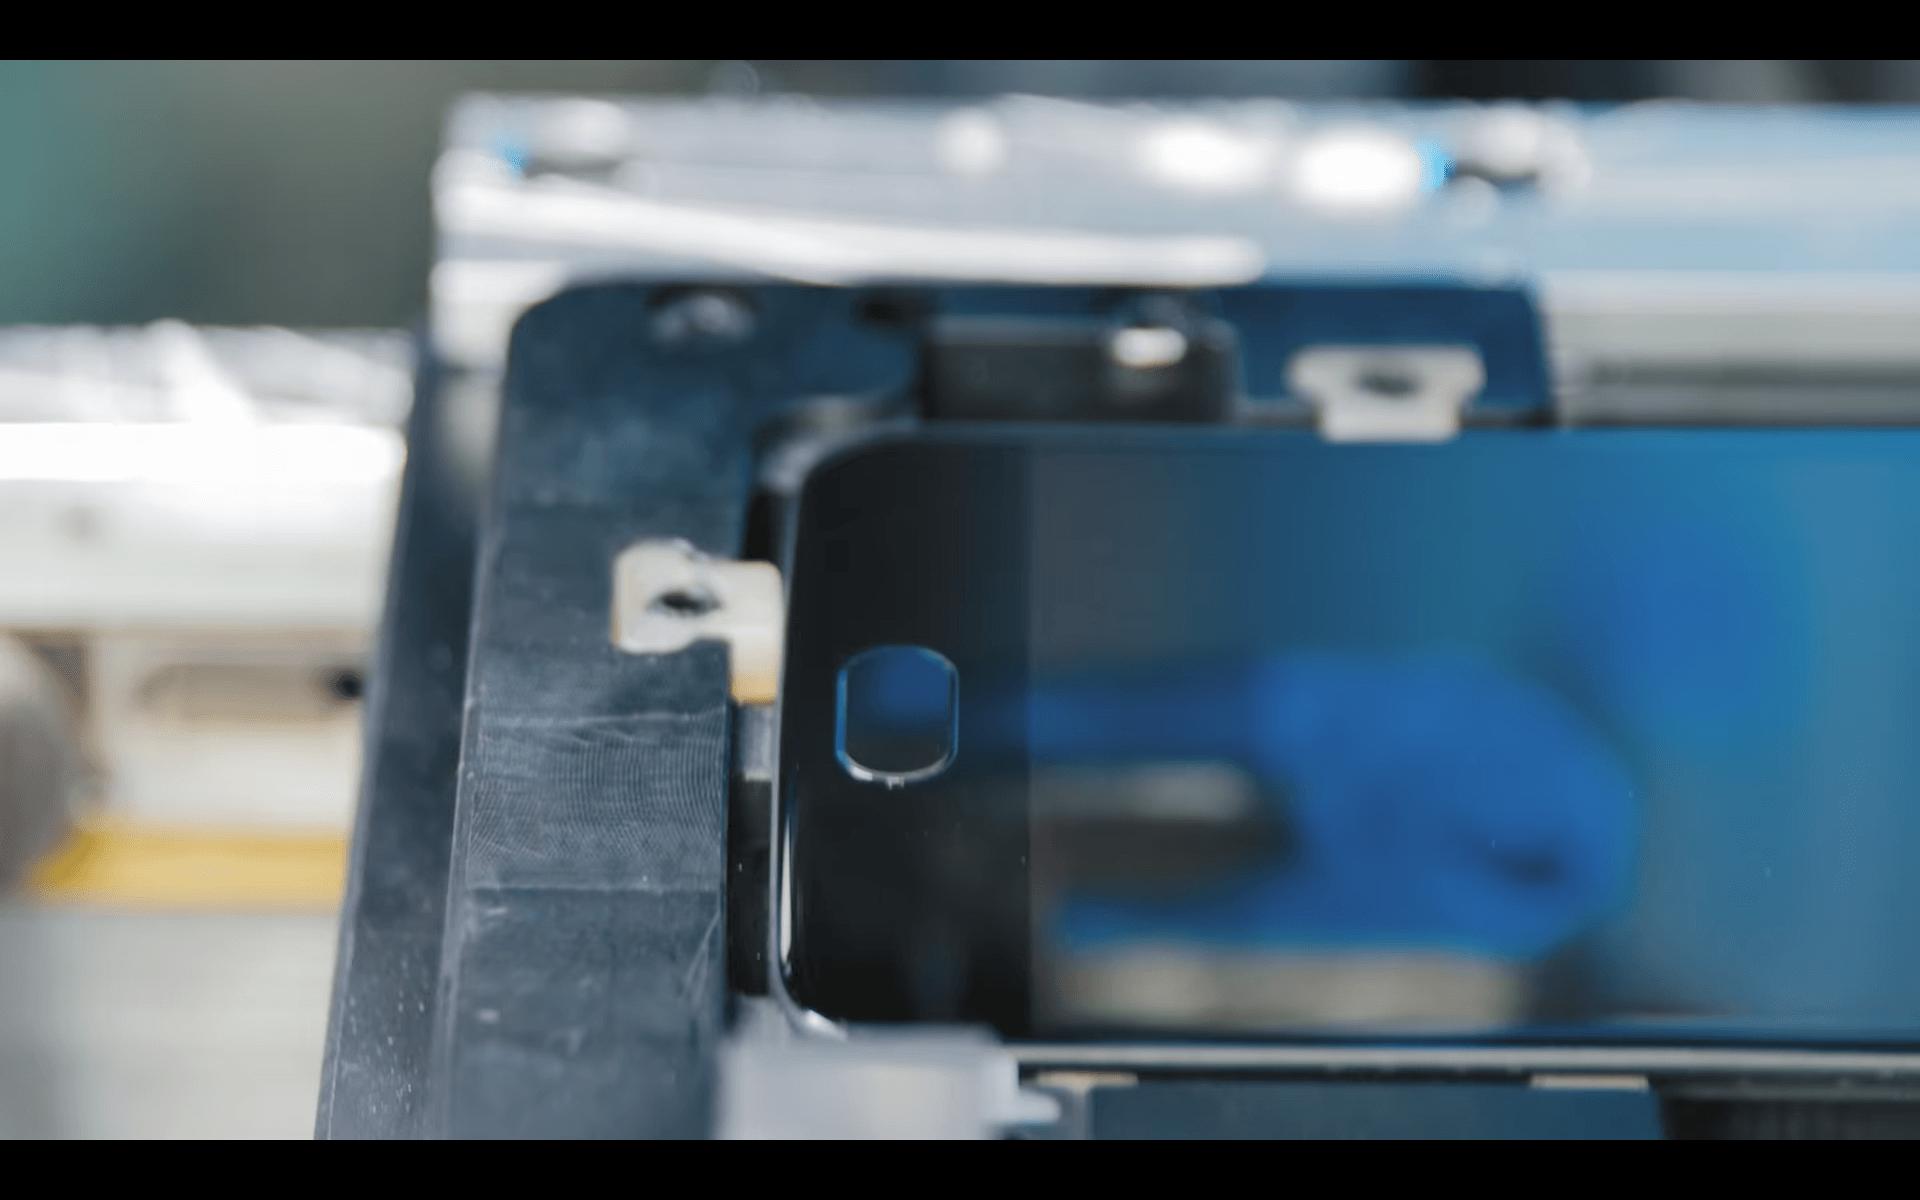 OnePlus veut améliorer son SAV à l'approche du OnePlus 5